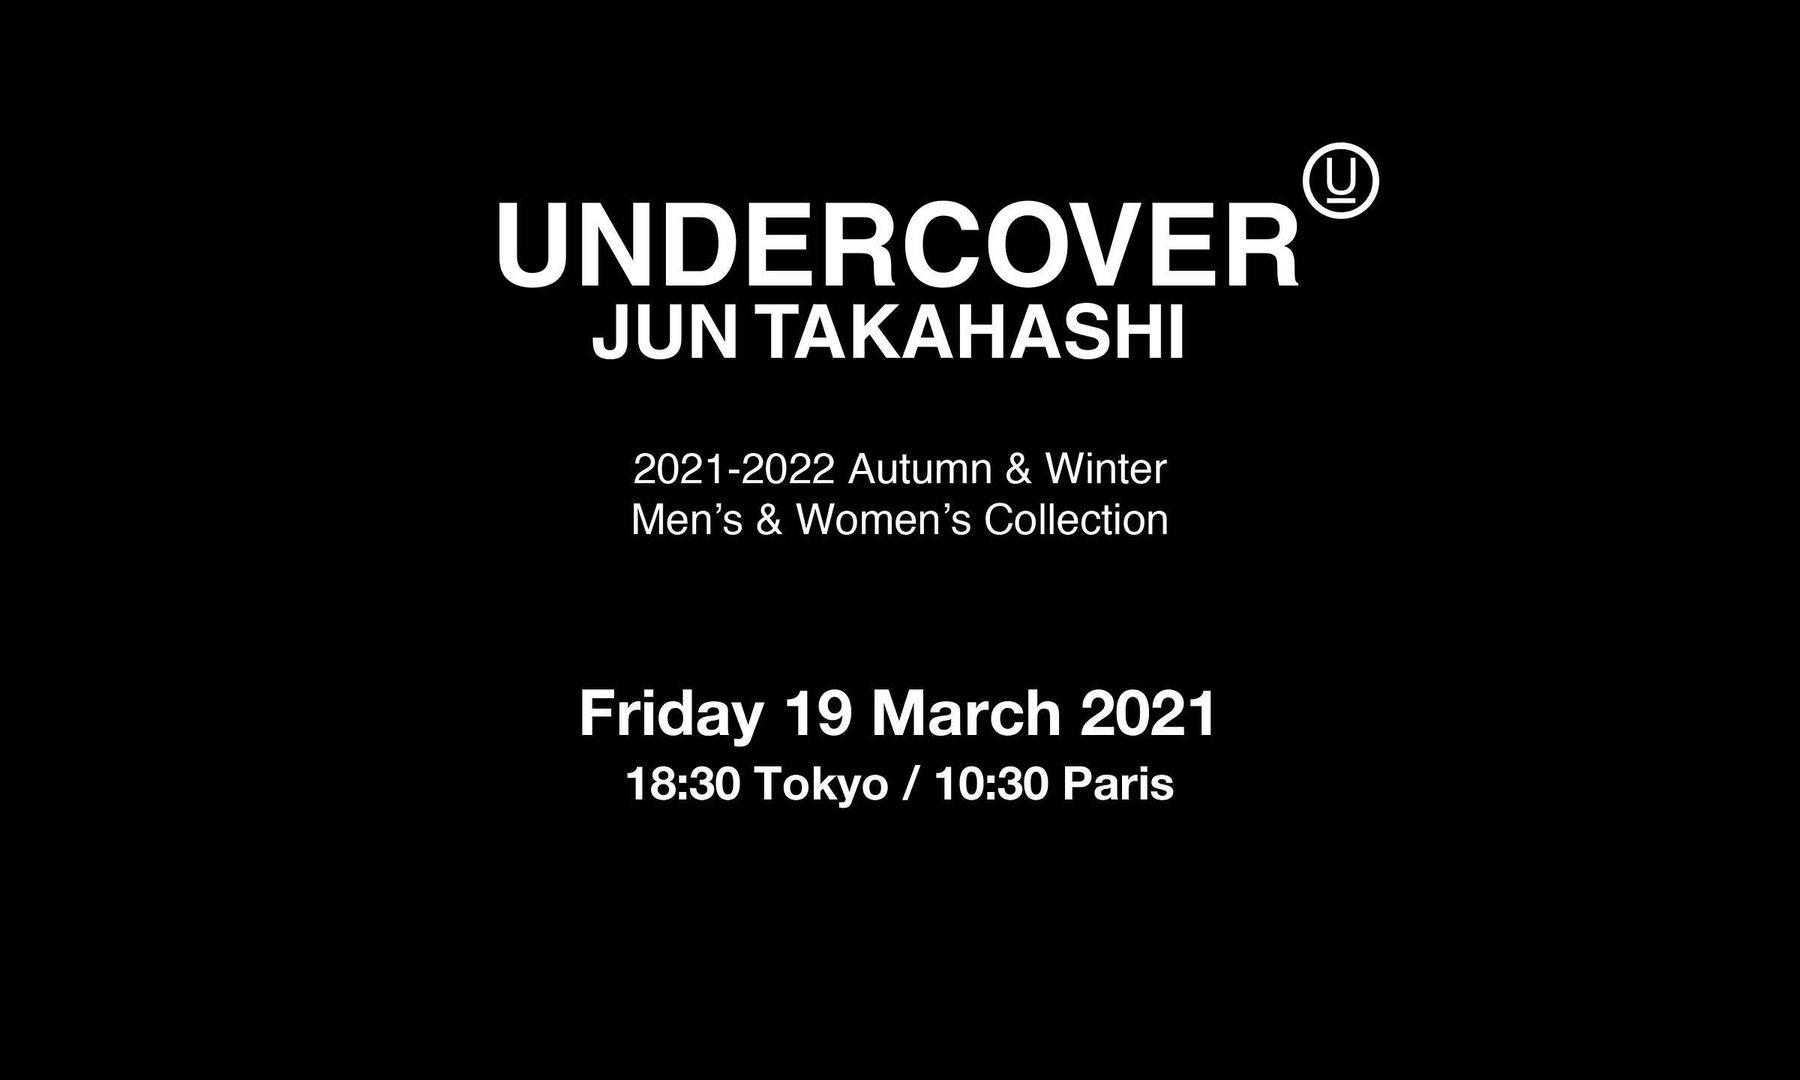 UNDERCOVER 将参与东京时装周全新「by R」项目